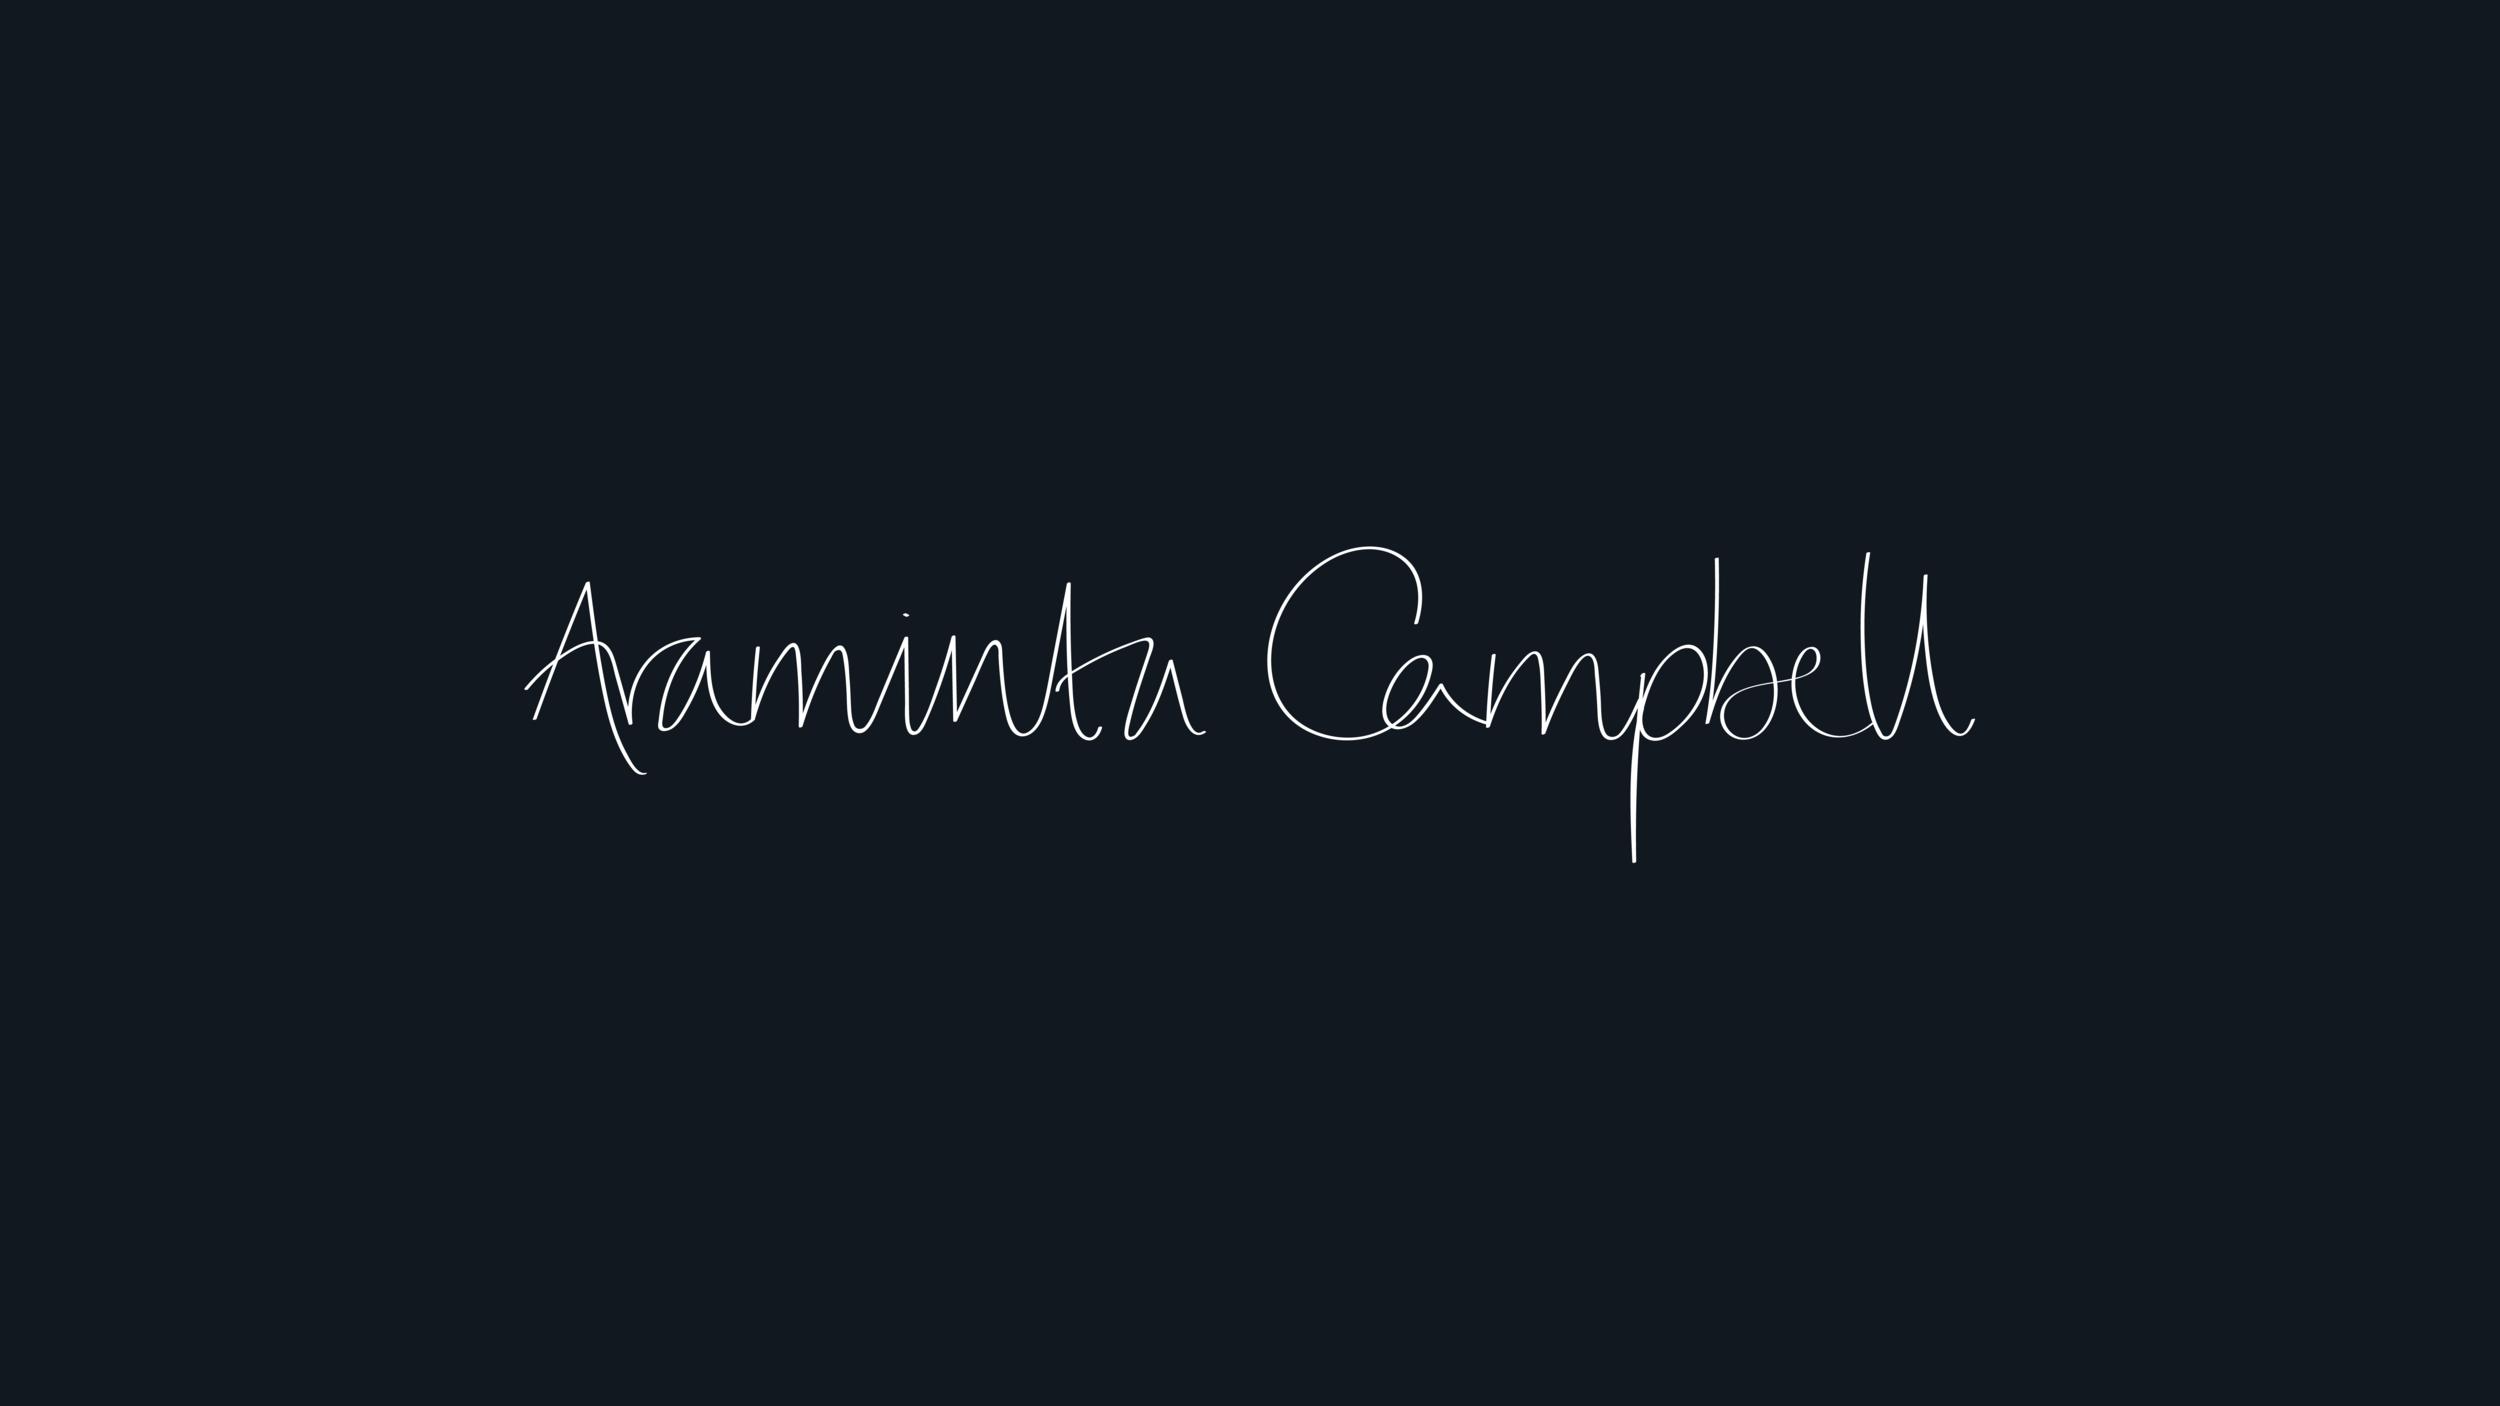 Ref-0008-AramintaCampbell-Logos-01.png